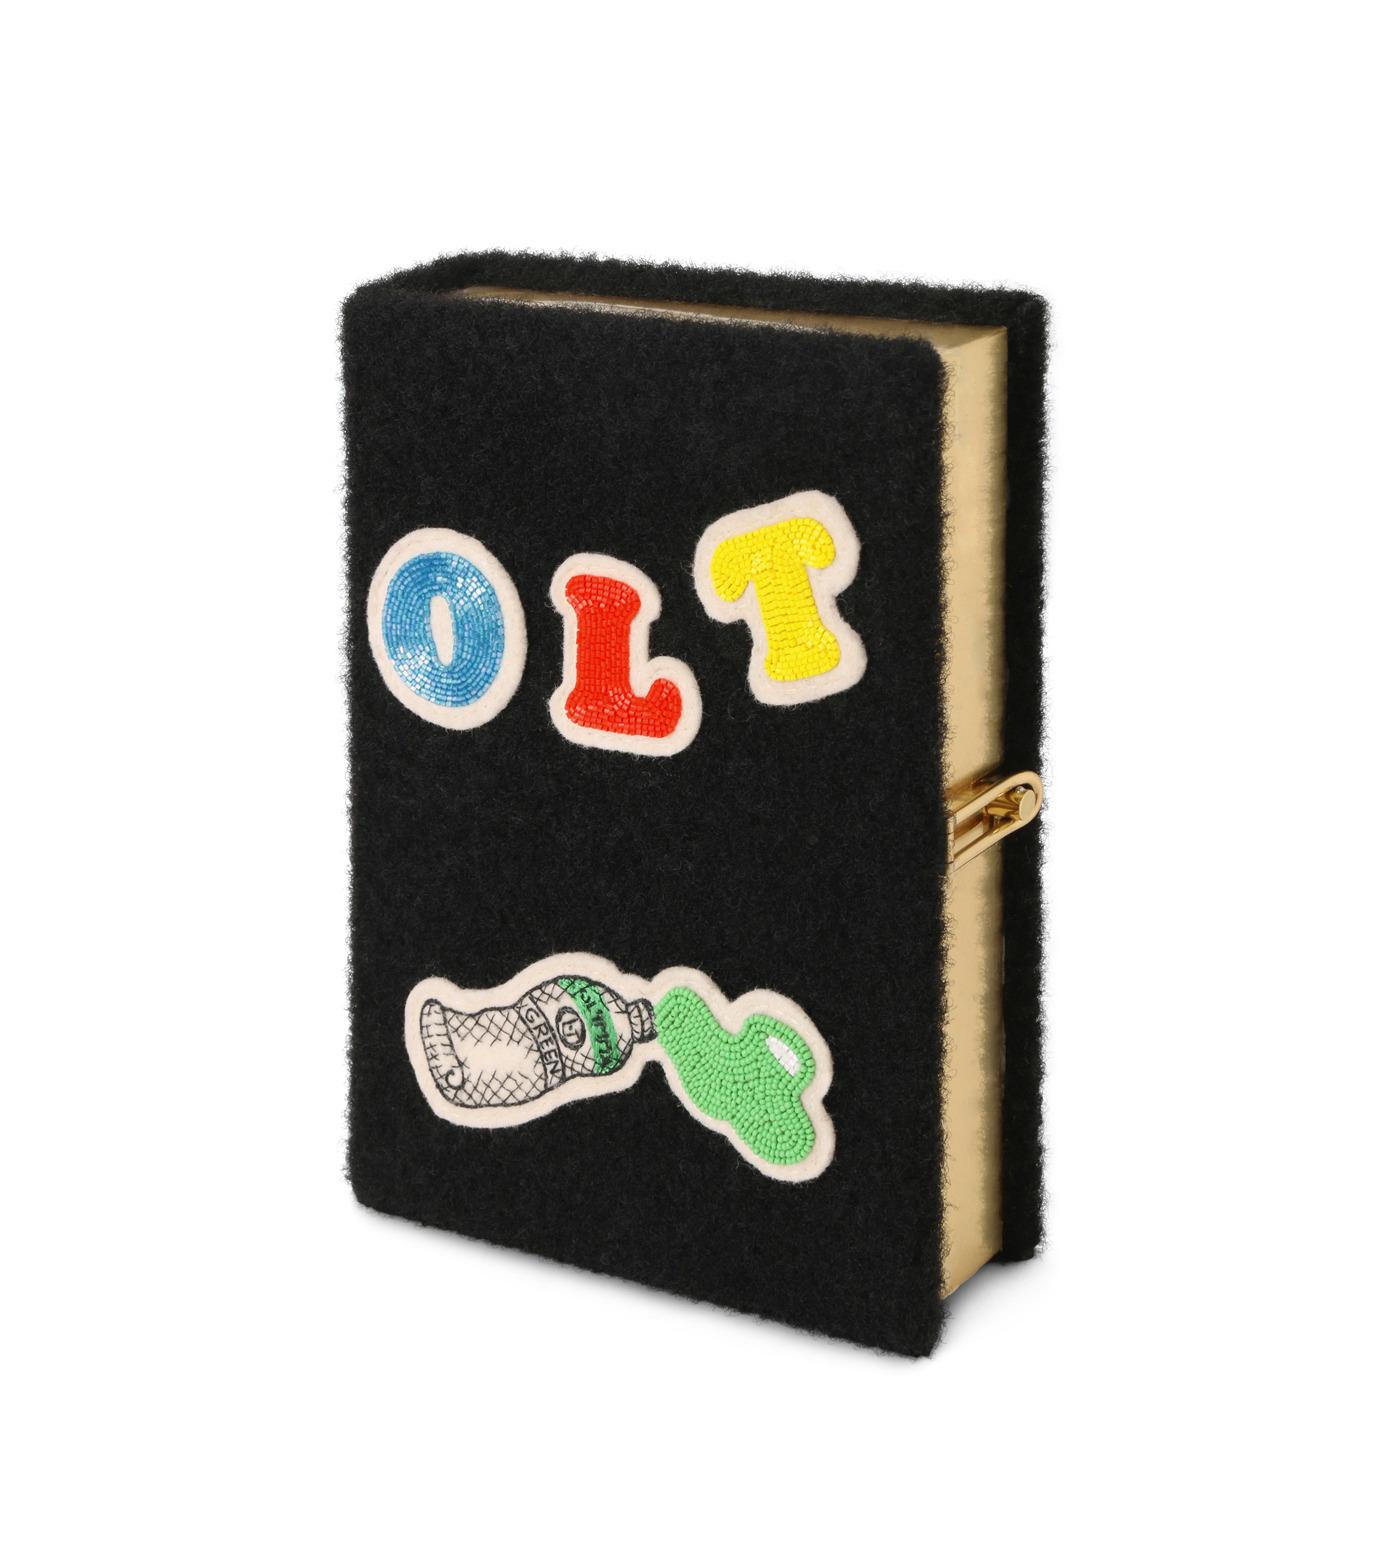 Olympia Le-Tan(オリンピア ルタン)のBook Clutch Velcro-BLACK(クラッチバッグ/clutch bag)-FW16BBC024-13 拡大詳細画像2